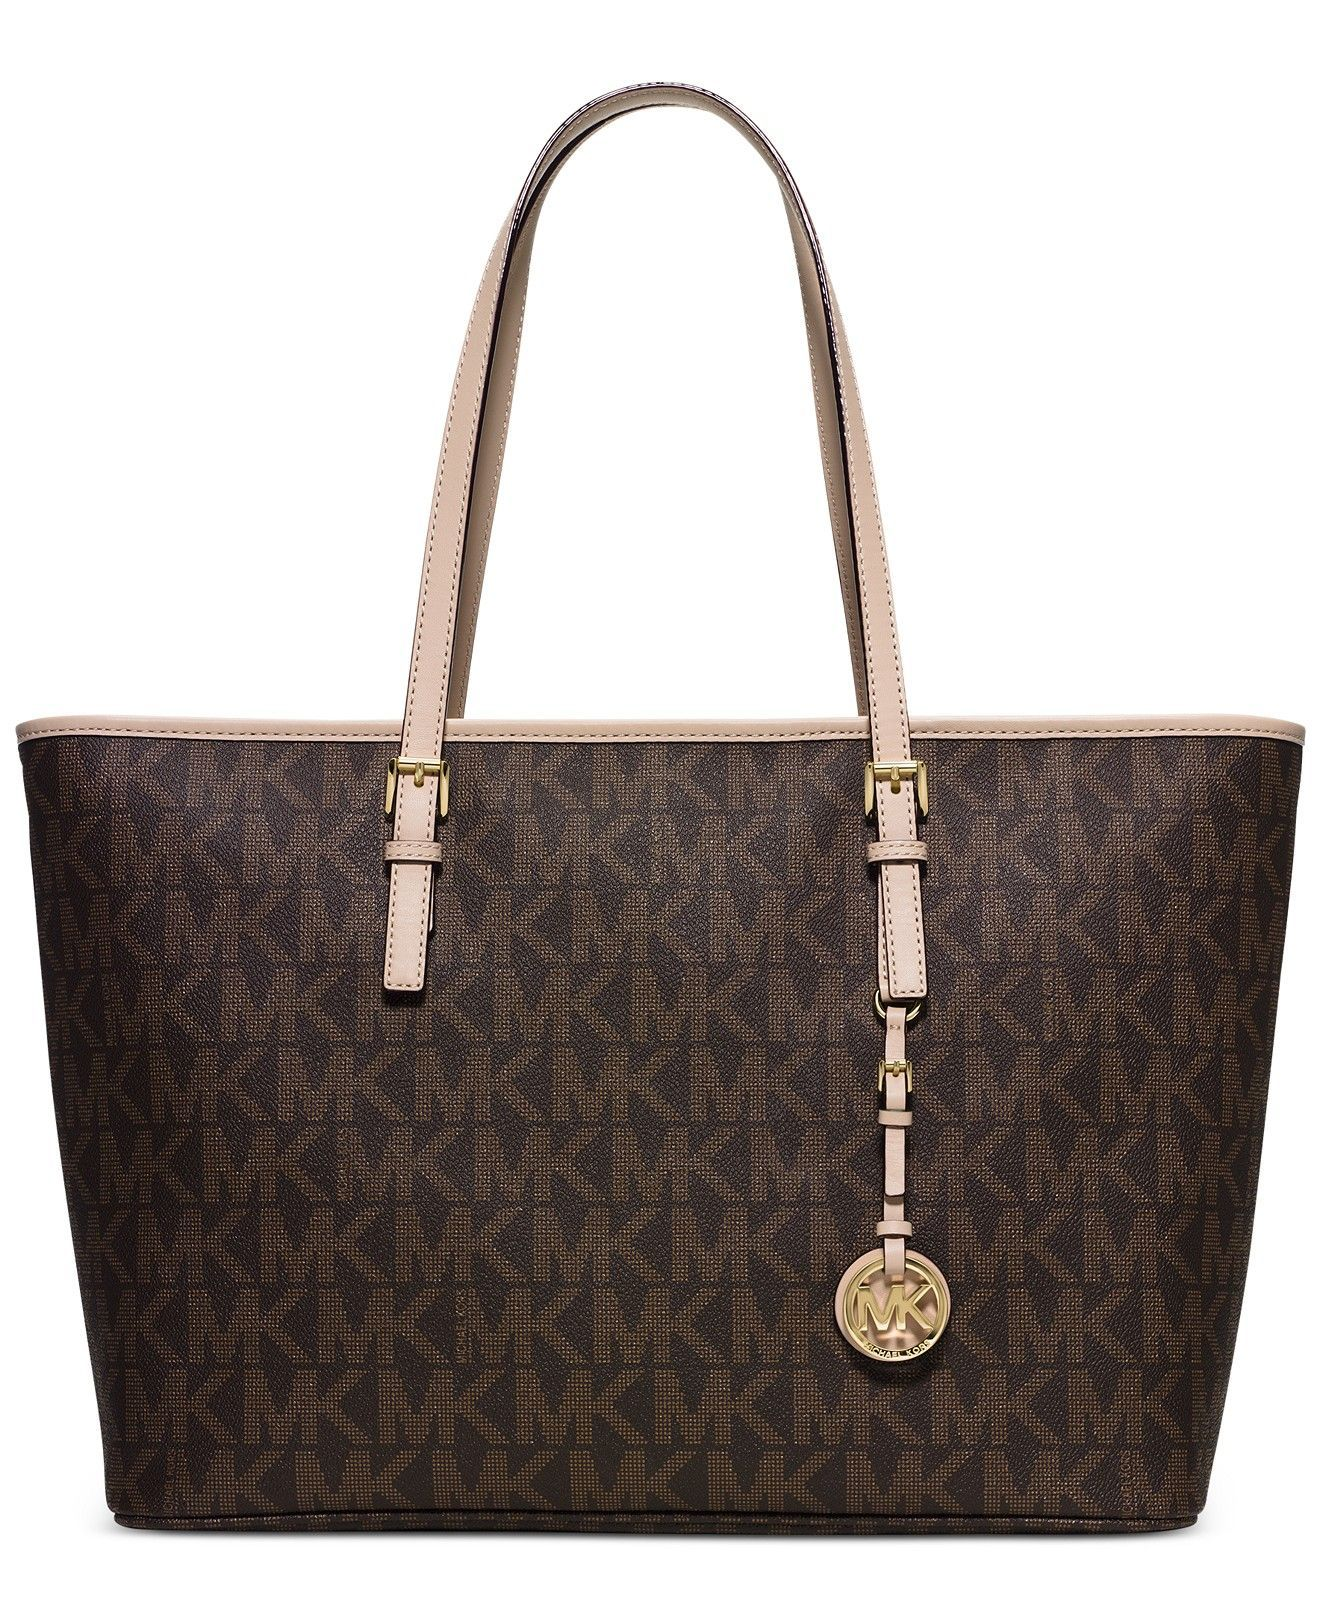 6c7b9a688da75 MICHAEL Michael Kors Jet Set Travel Medium Top Zip Multifunction Tote - Michael  Kors Handbags - Handbags Accessories - Macys